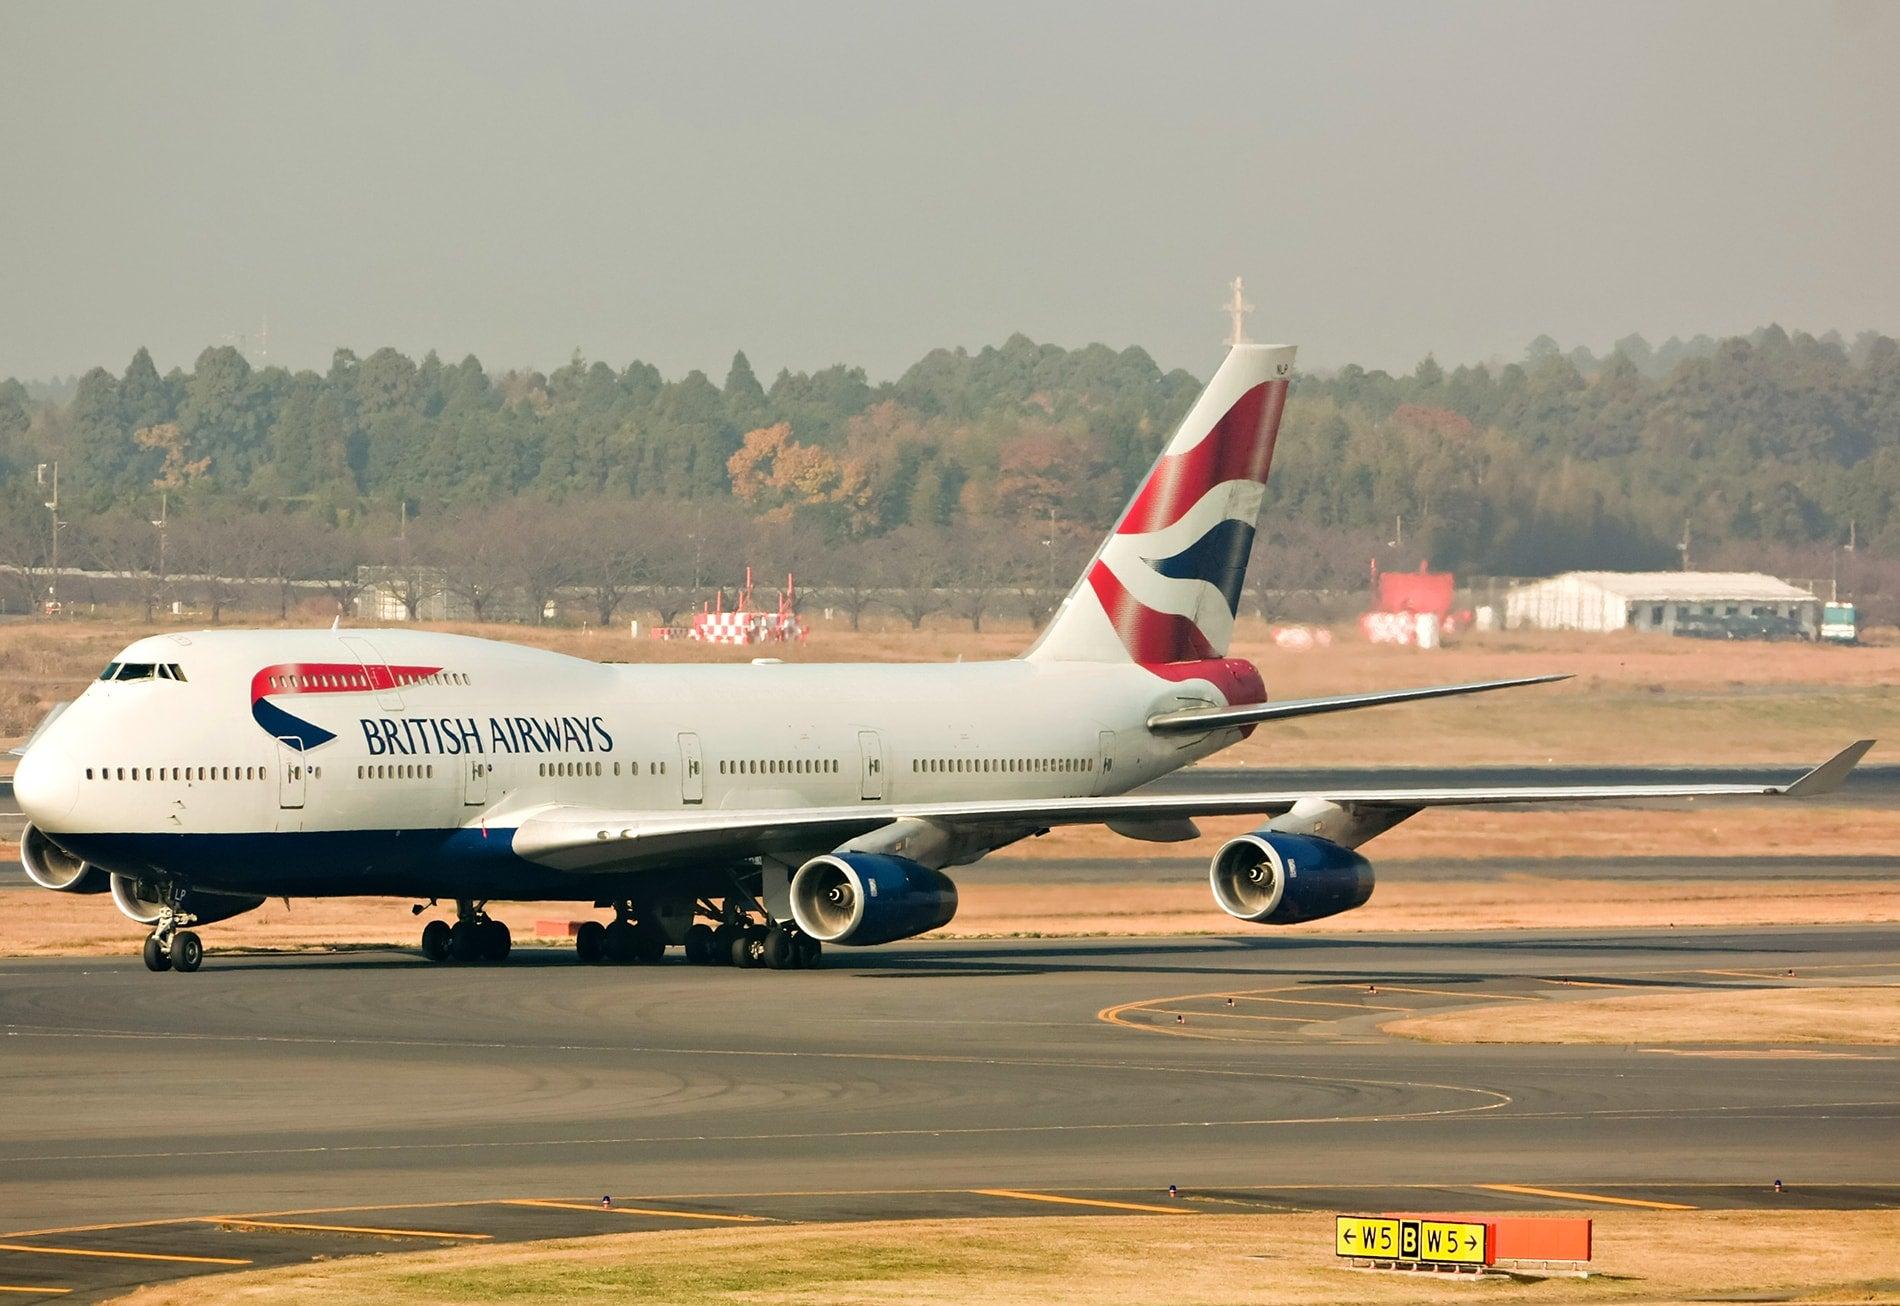 aereo british airways check in online edreams blog di viaggi